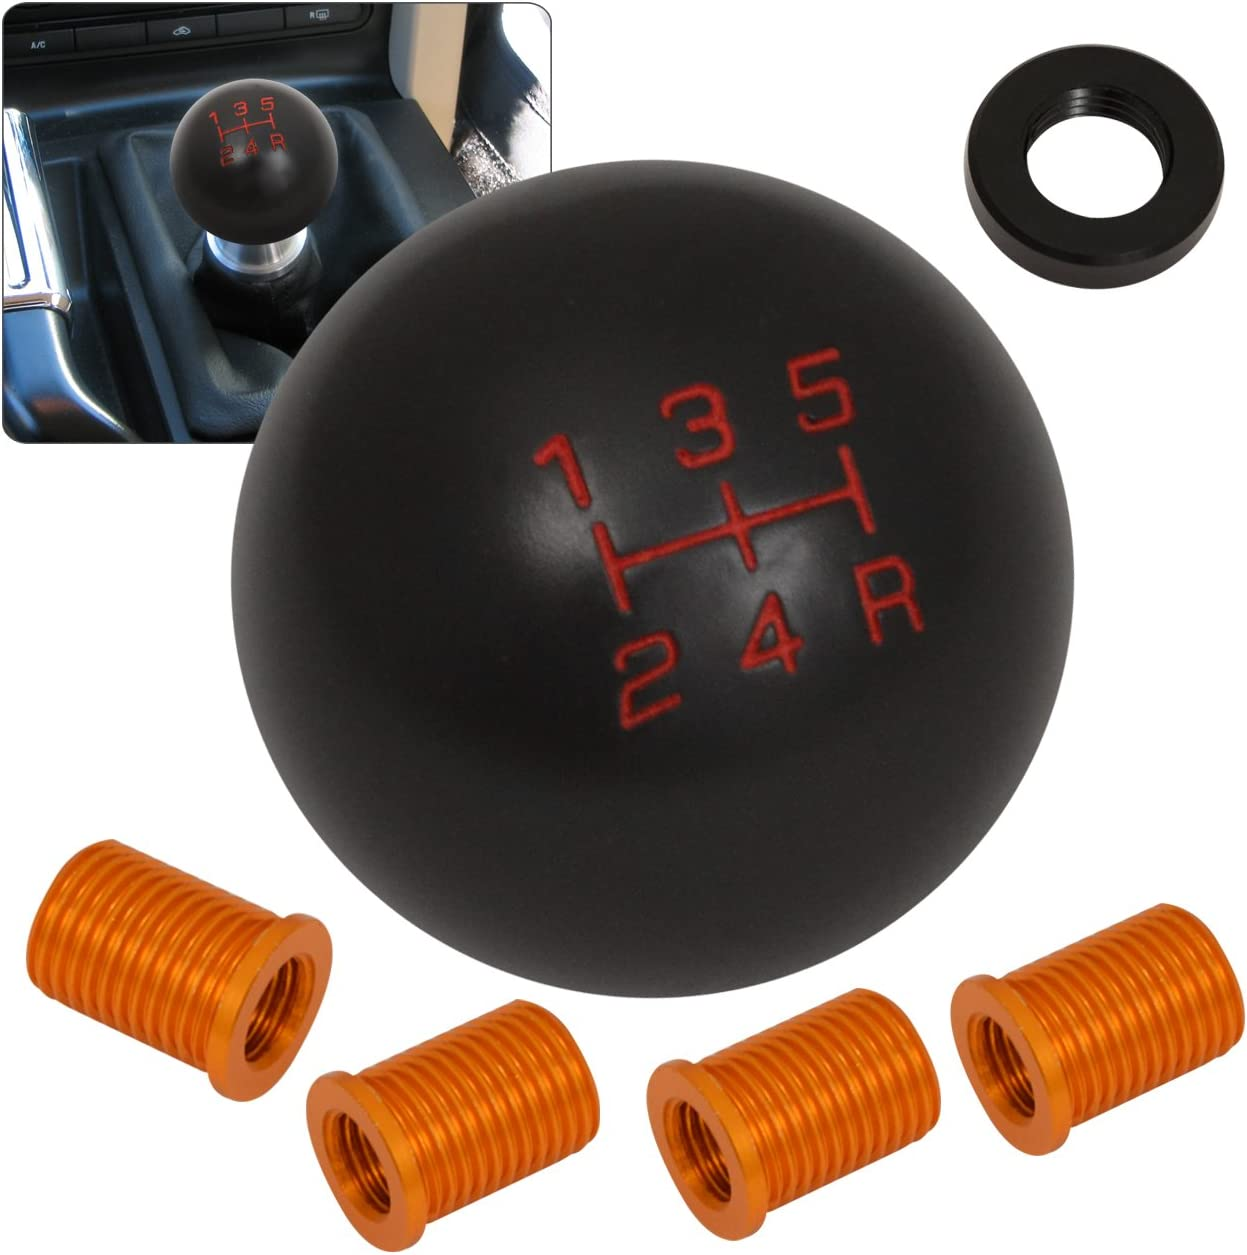 ACAMPTAR Universal Car Auto Black 8 Ball Gear Shift Shifter Knob W 8mm 10mm 12mm Adapter